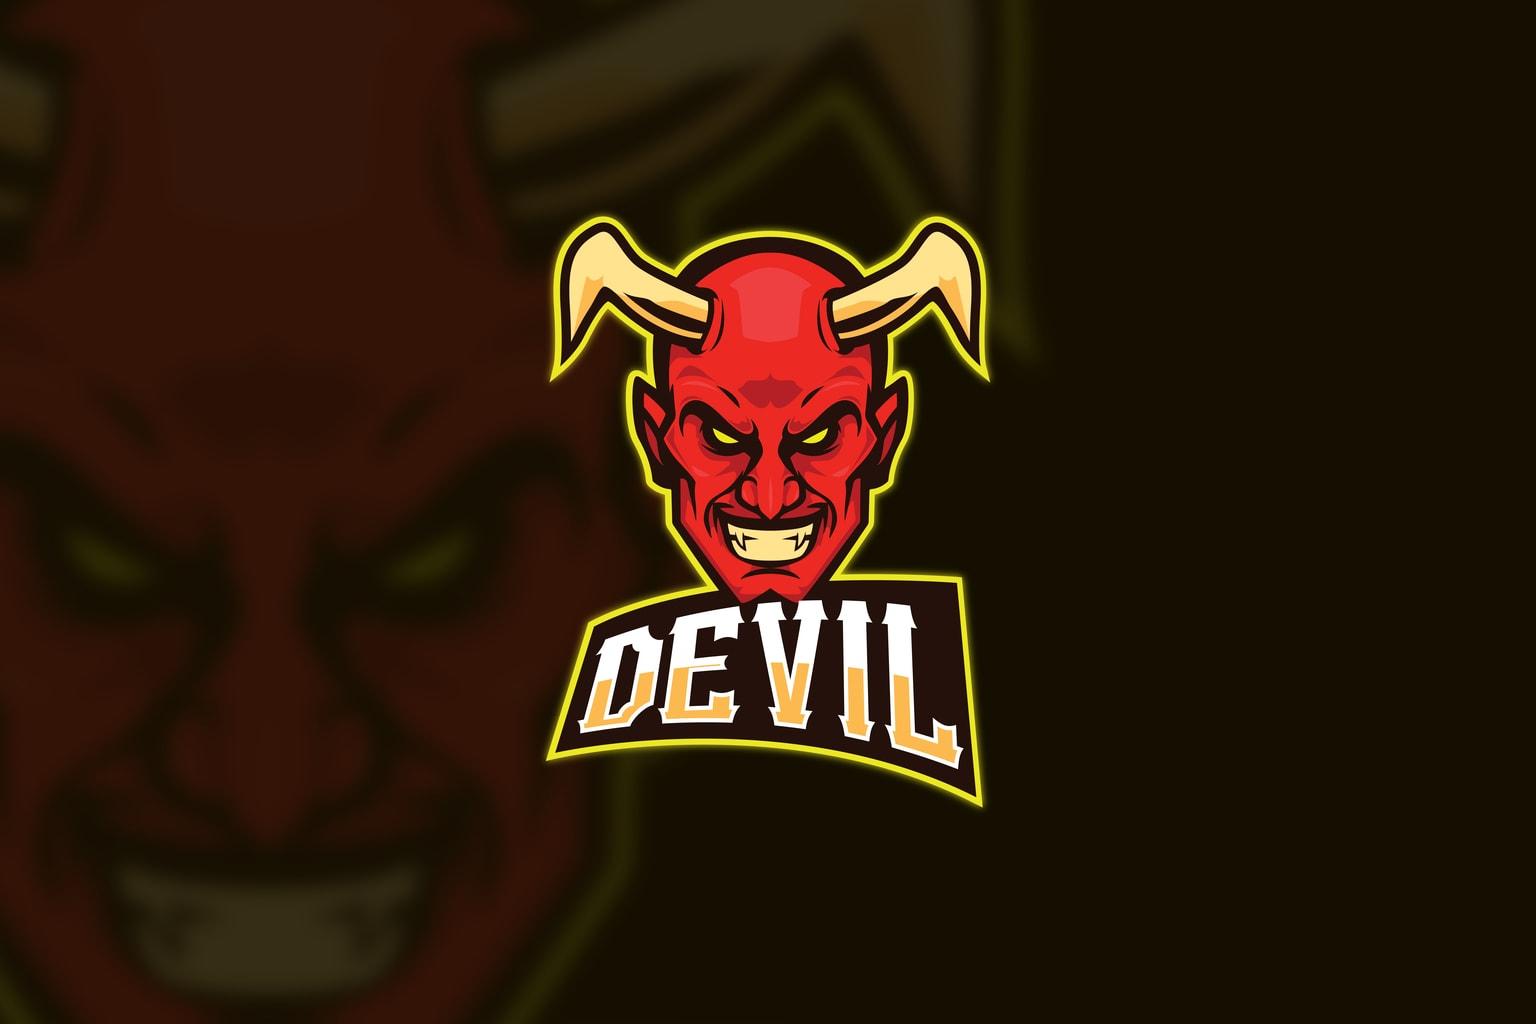 esport logo evil bullies